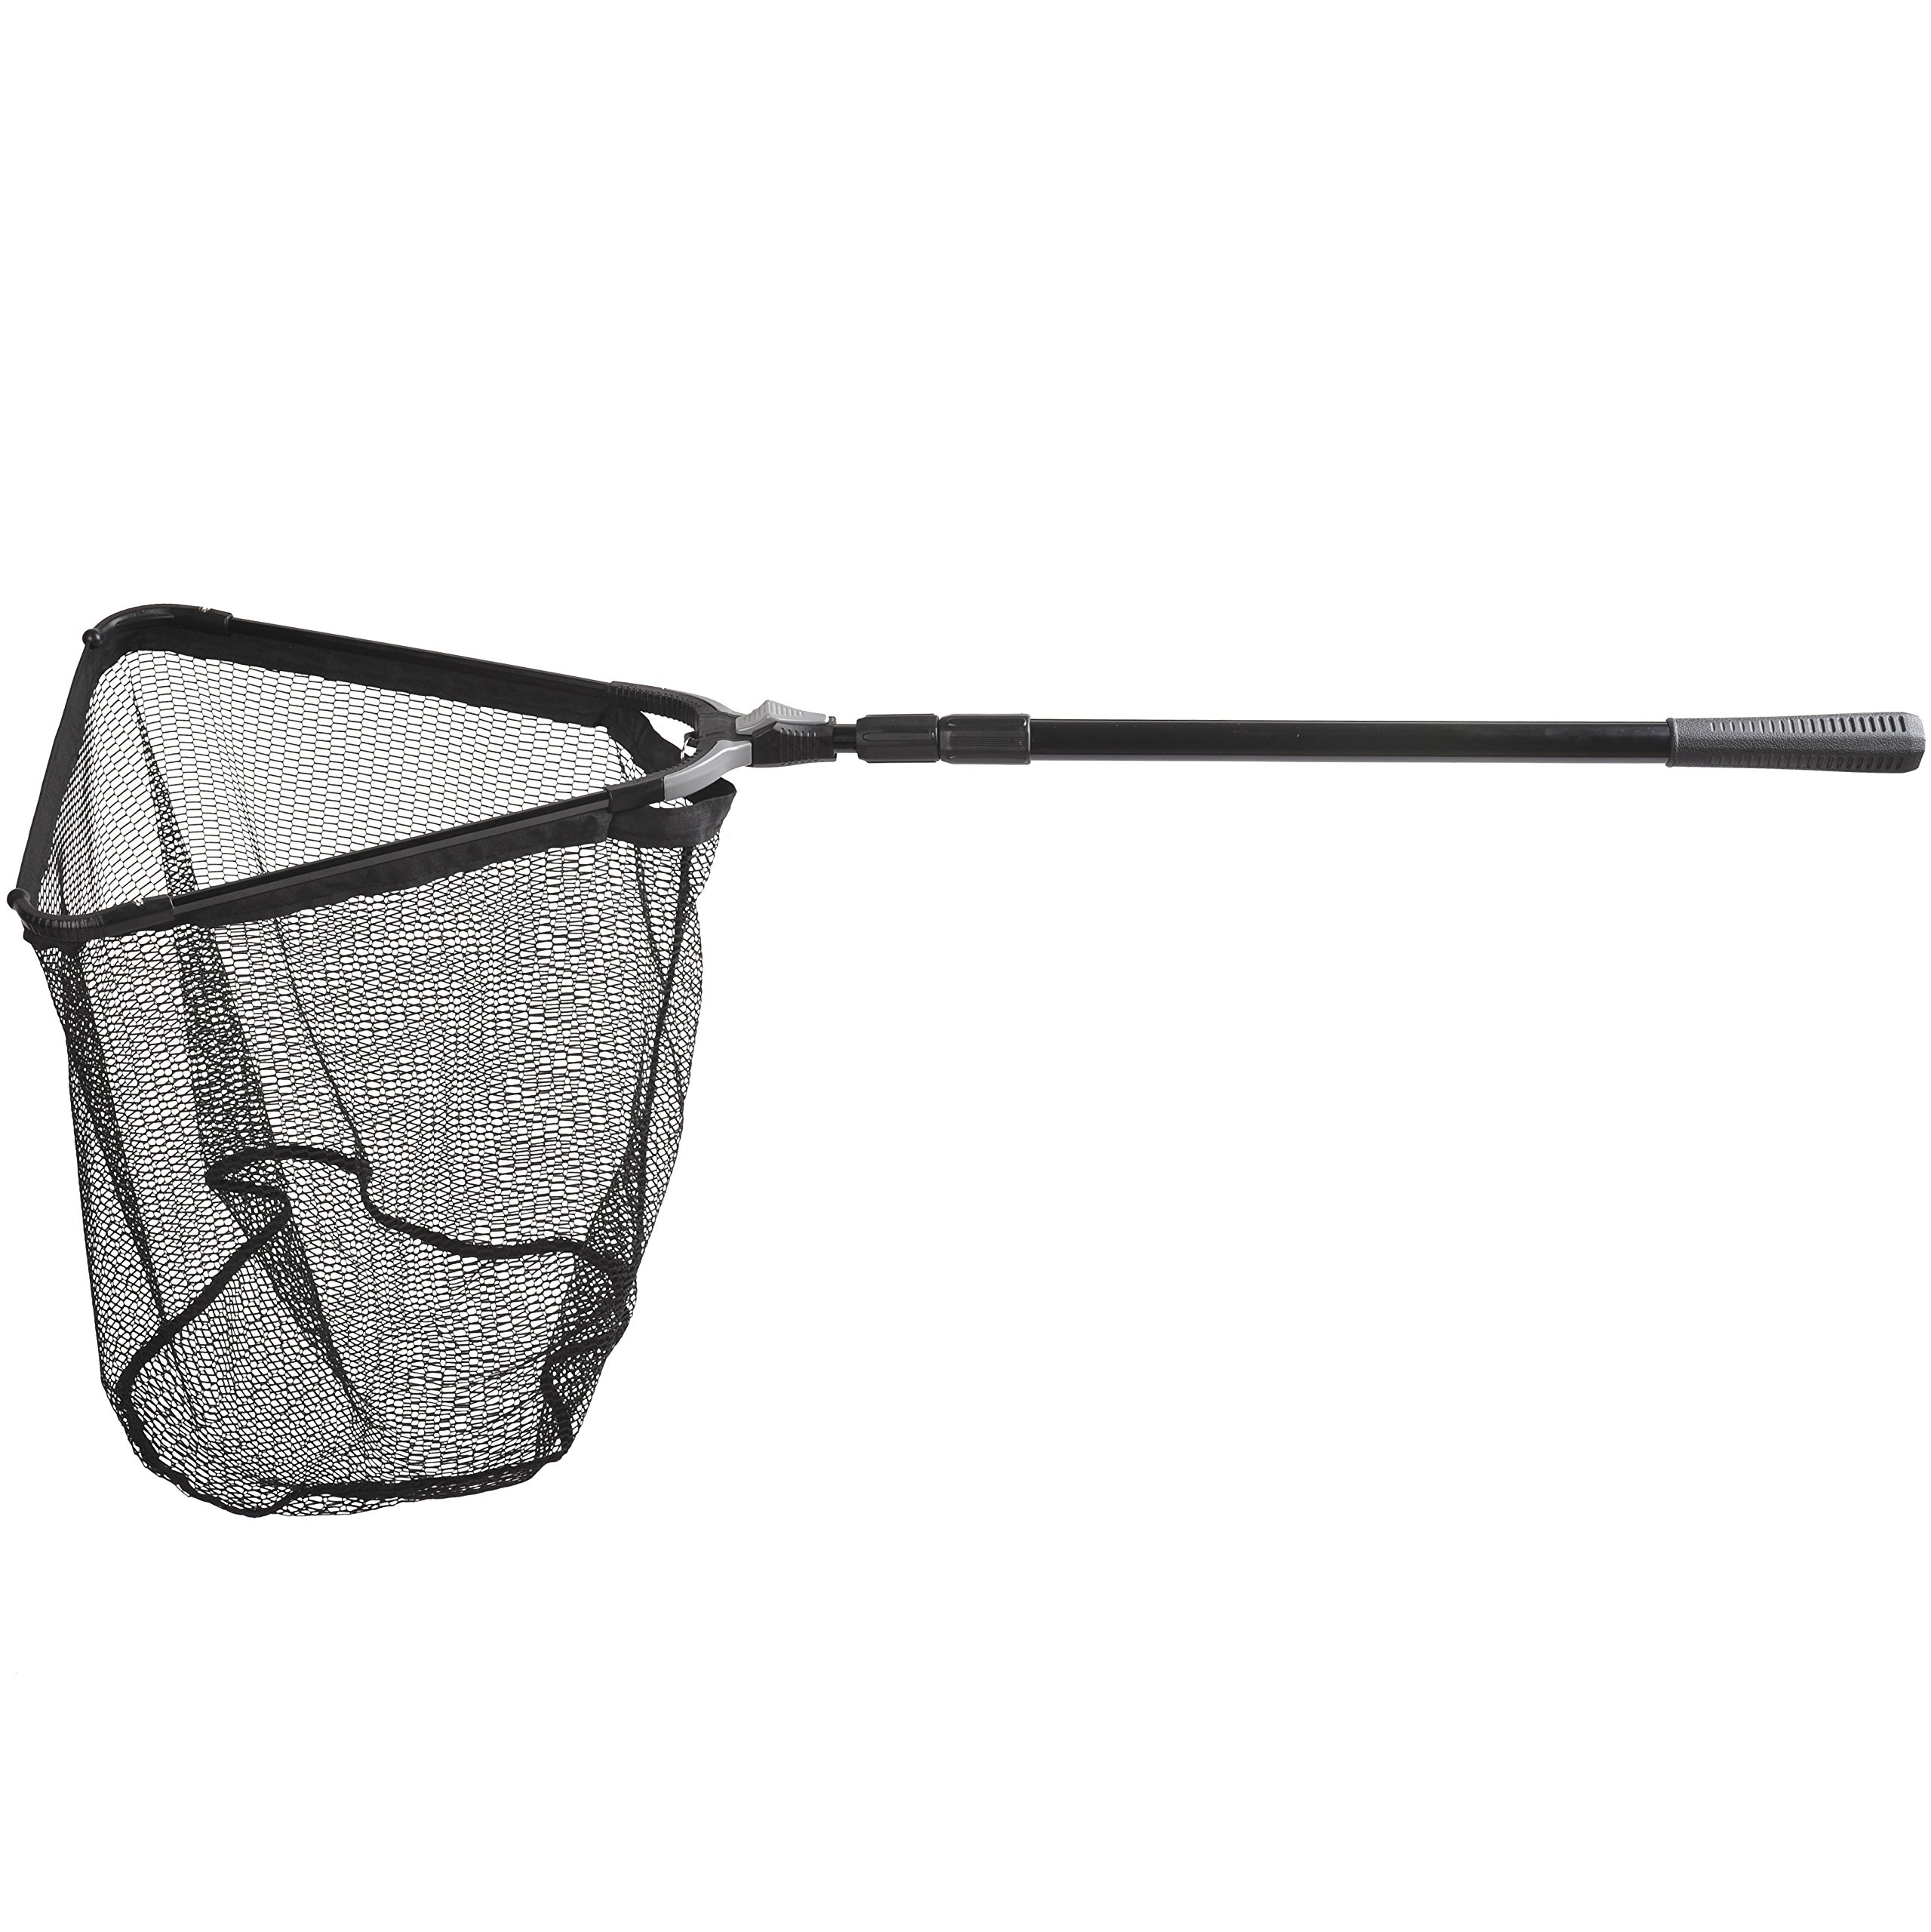 Fiblink Folding Aluminum Fishing Landing Net Fish Net with Extending Telescoping Pole Handle (45-80 inches)